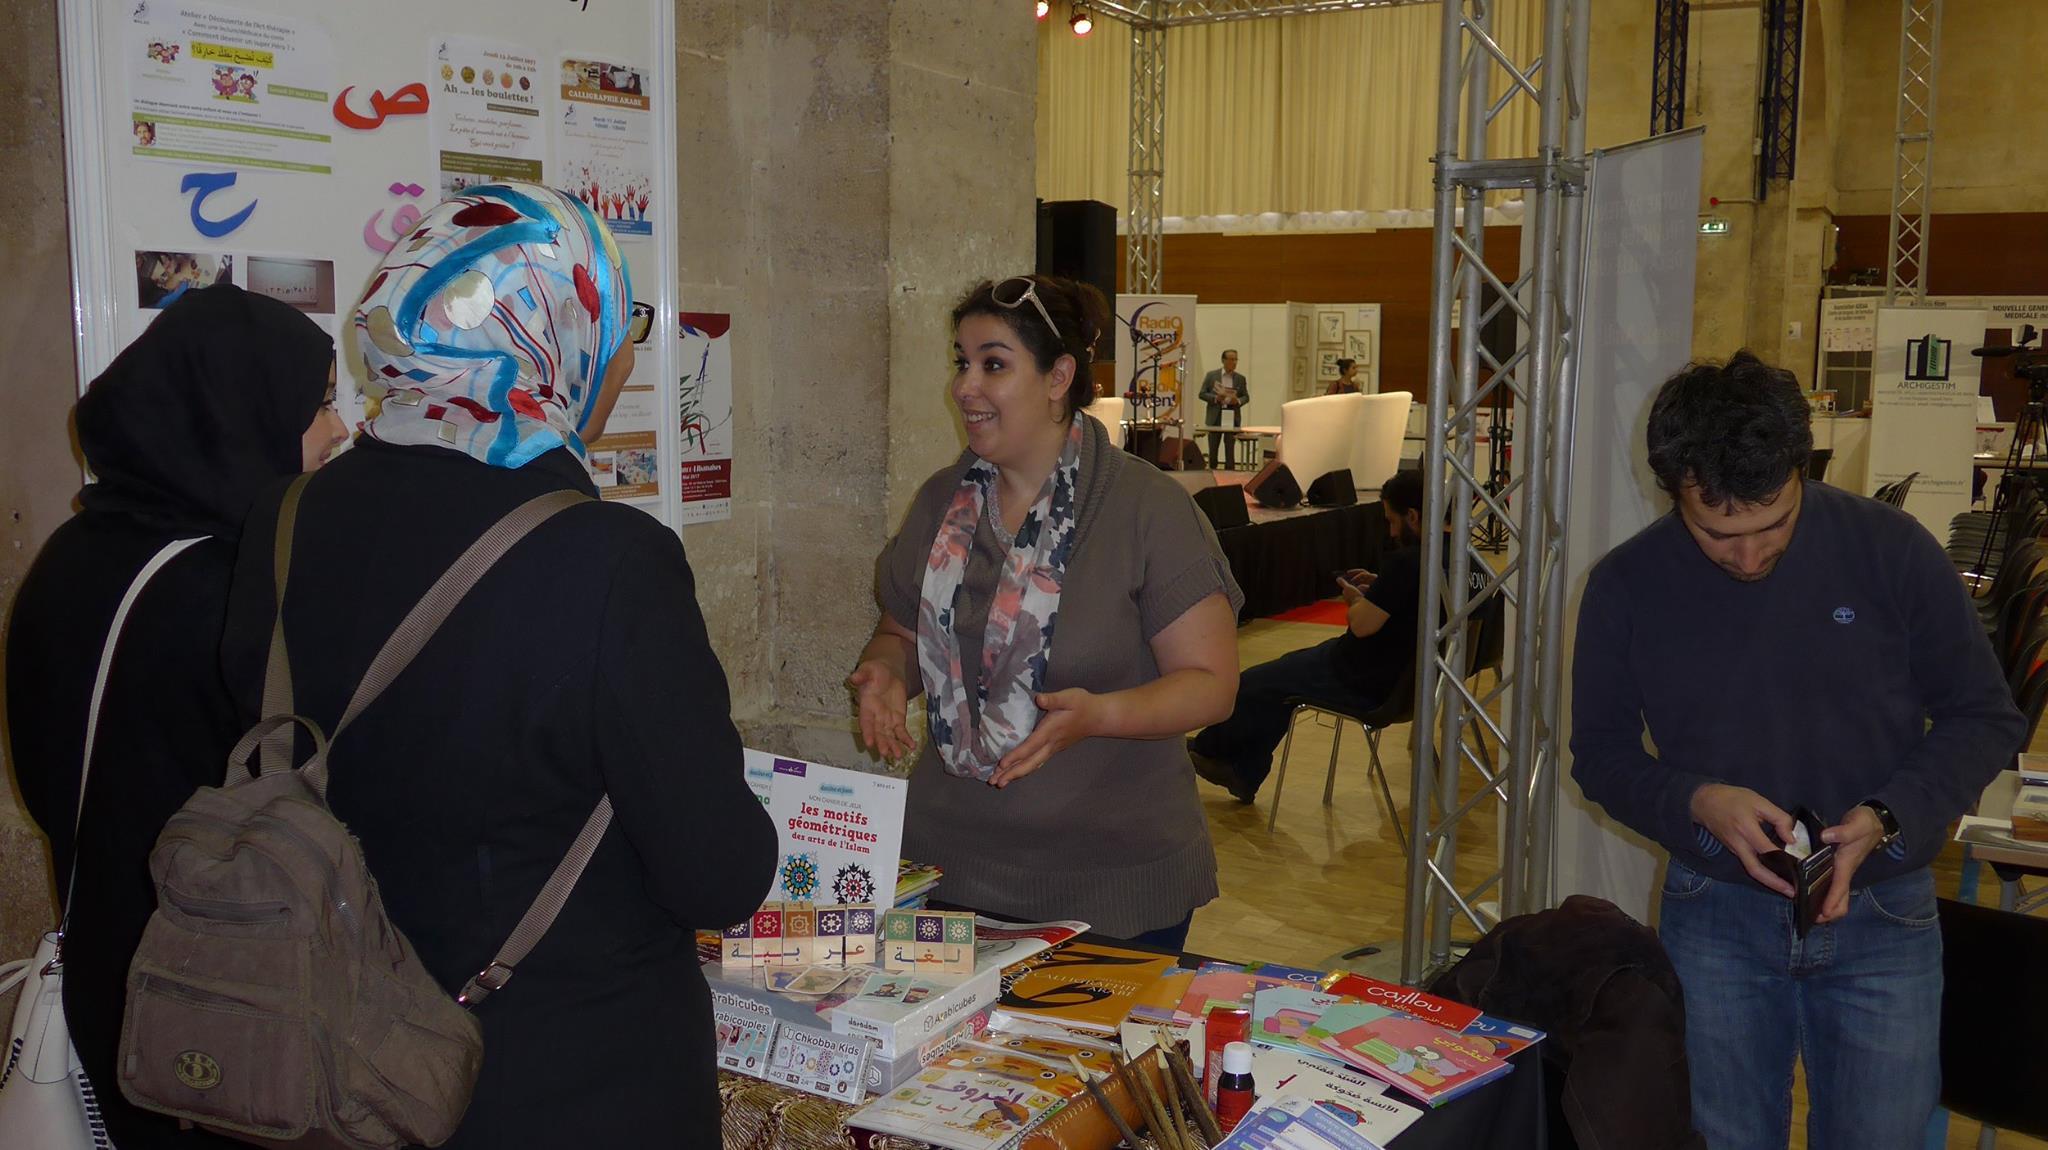 2017-05-12-14 Lebanon-Paris 43